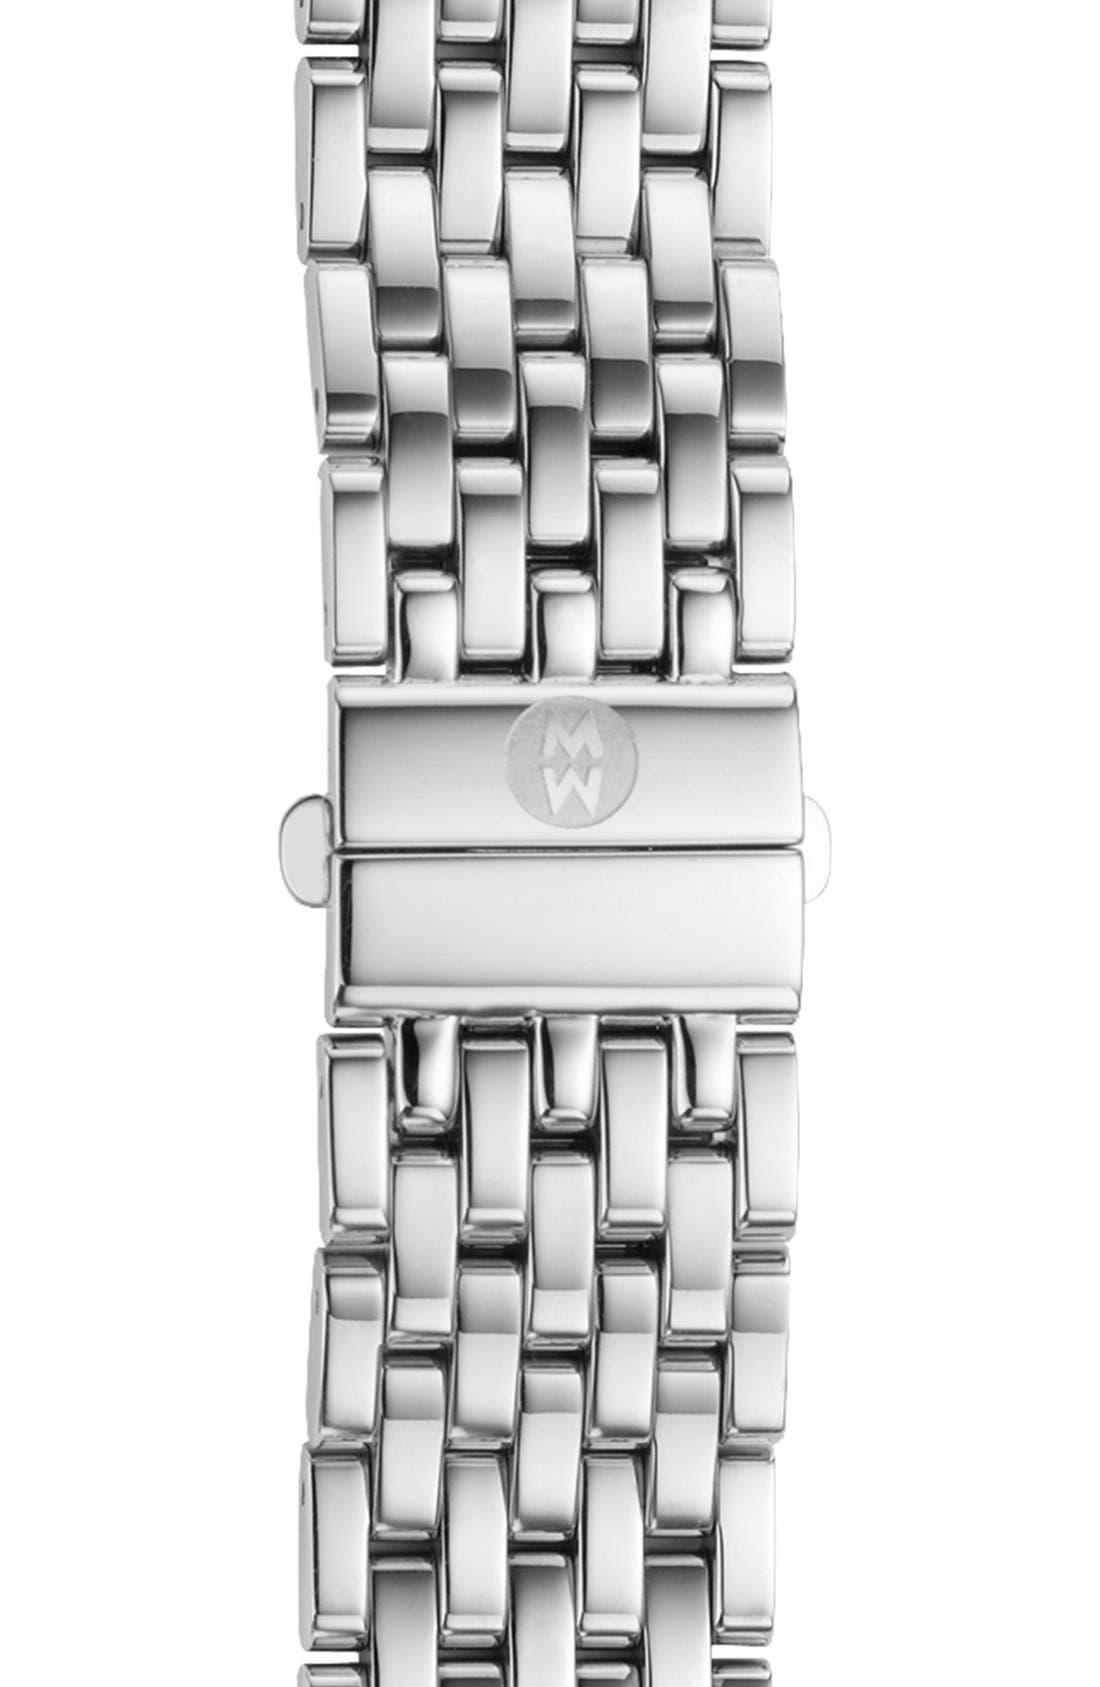 Alternate Image 1 Selected - MICHELE Deco 16 16mm Bracelet Watchband